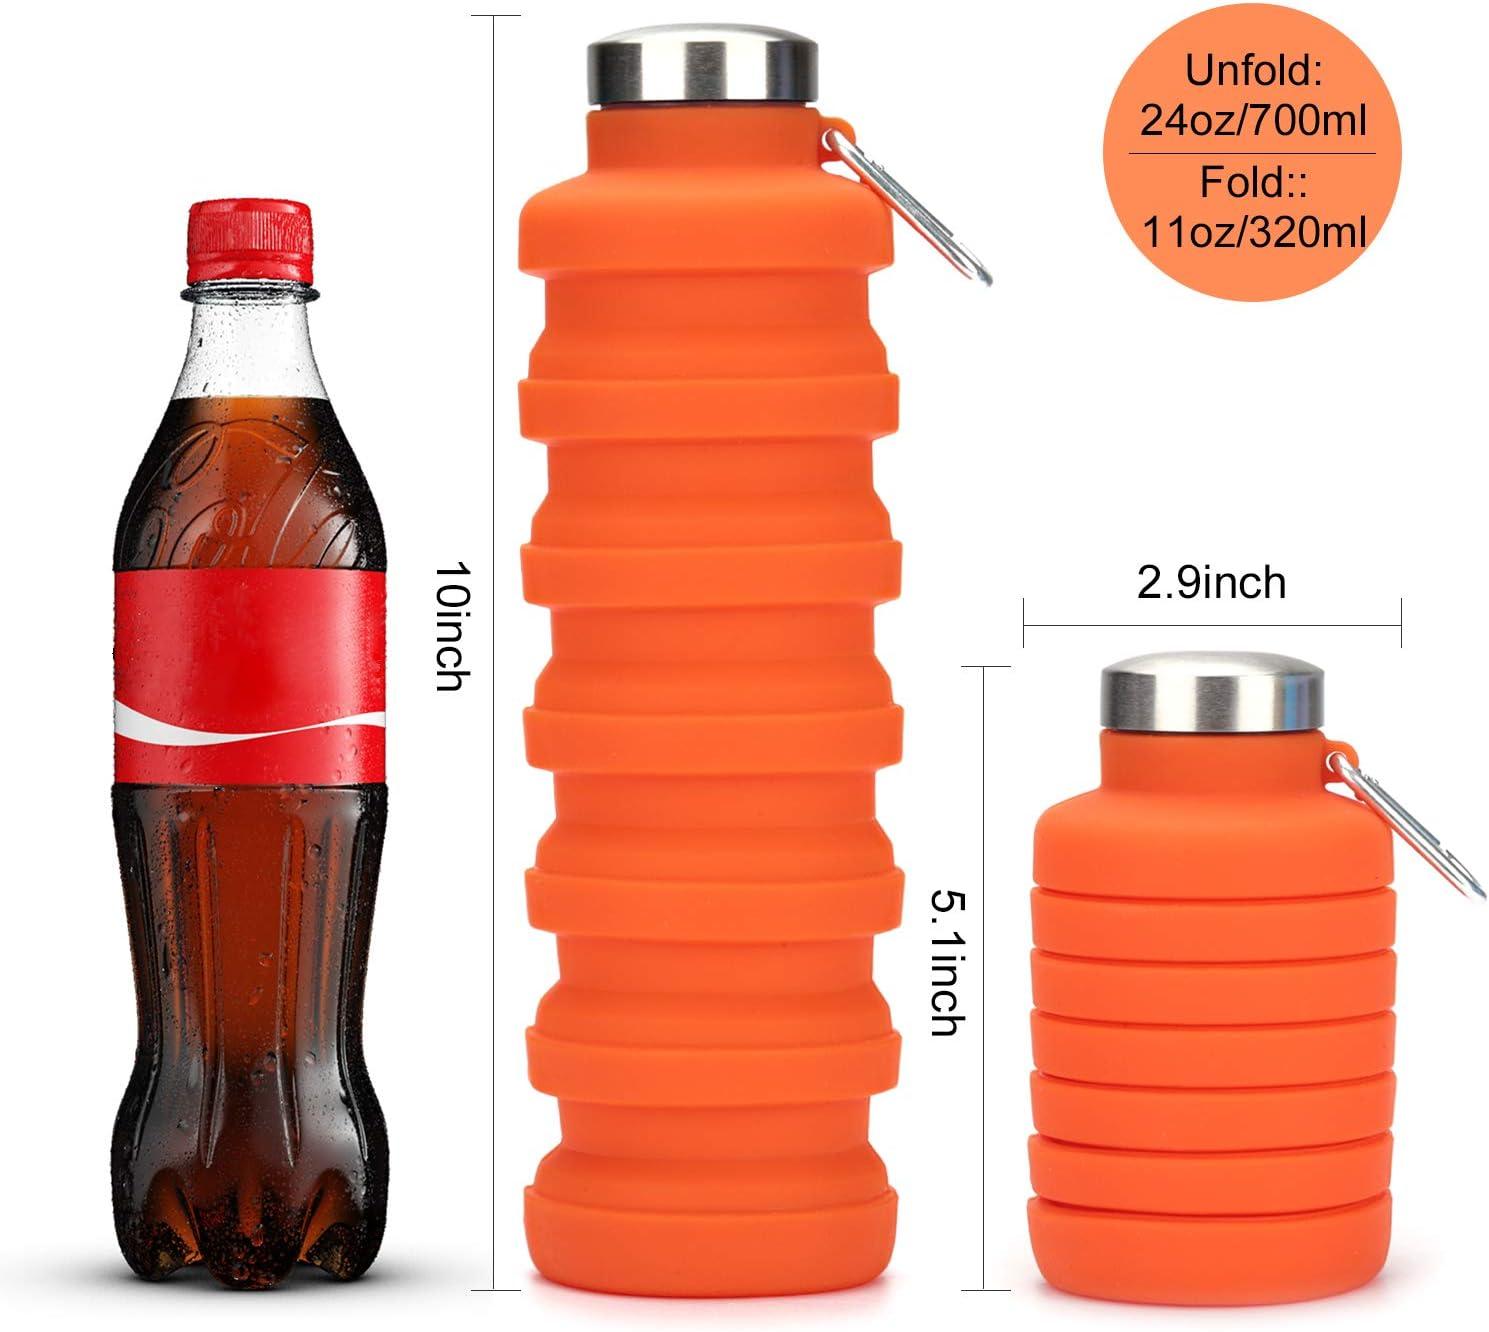 OSVAW Botella de Agua Plegable de Silicona de Grado alimenticio Botella de Agua Plegable sin BPA para Viajes Gimnasio Camping Senderismo Botella de Agua Deportiva port/átil